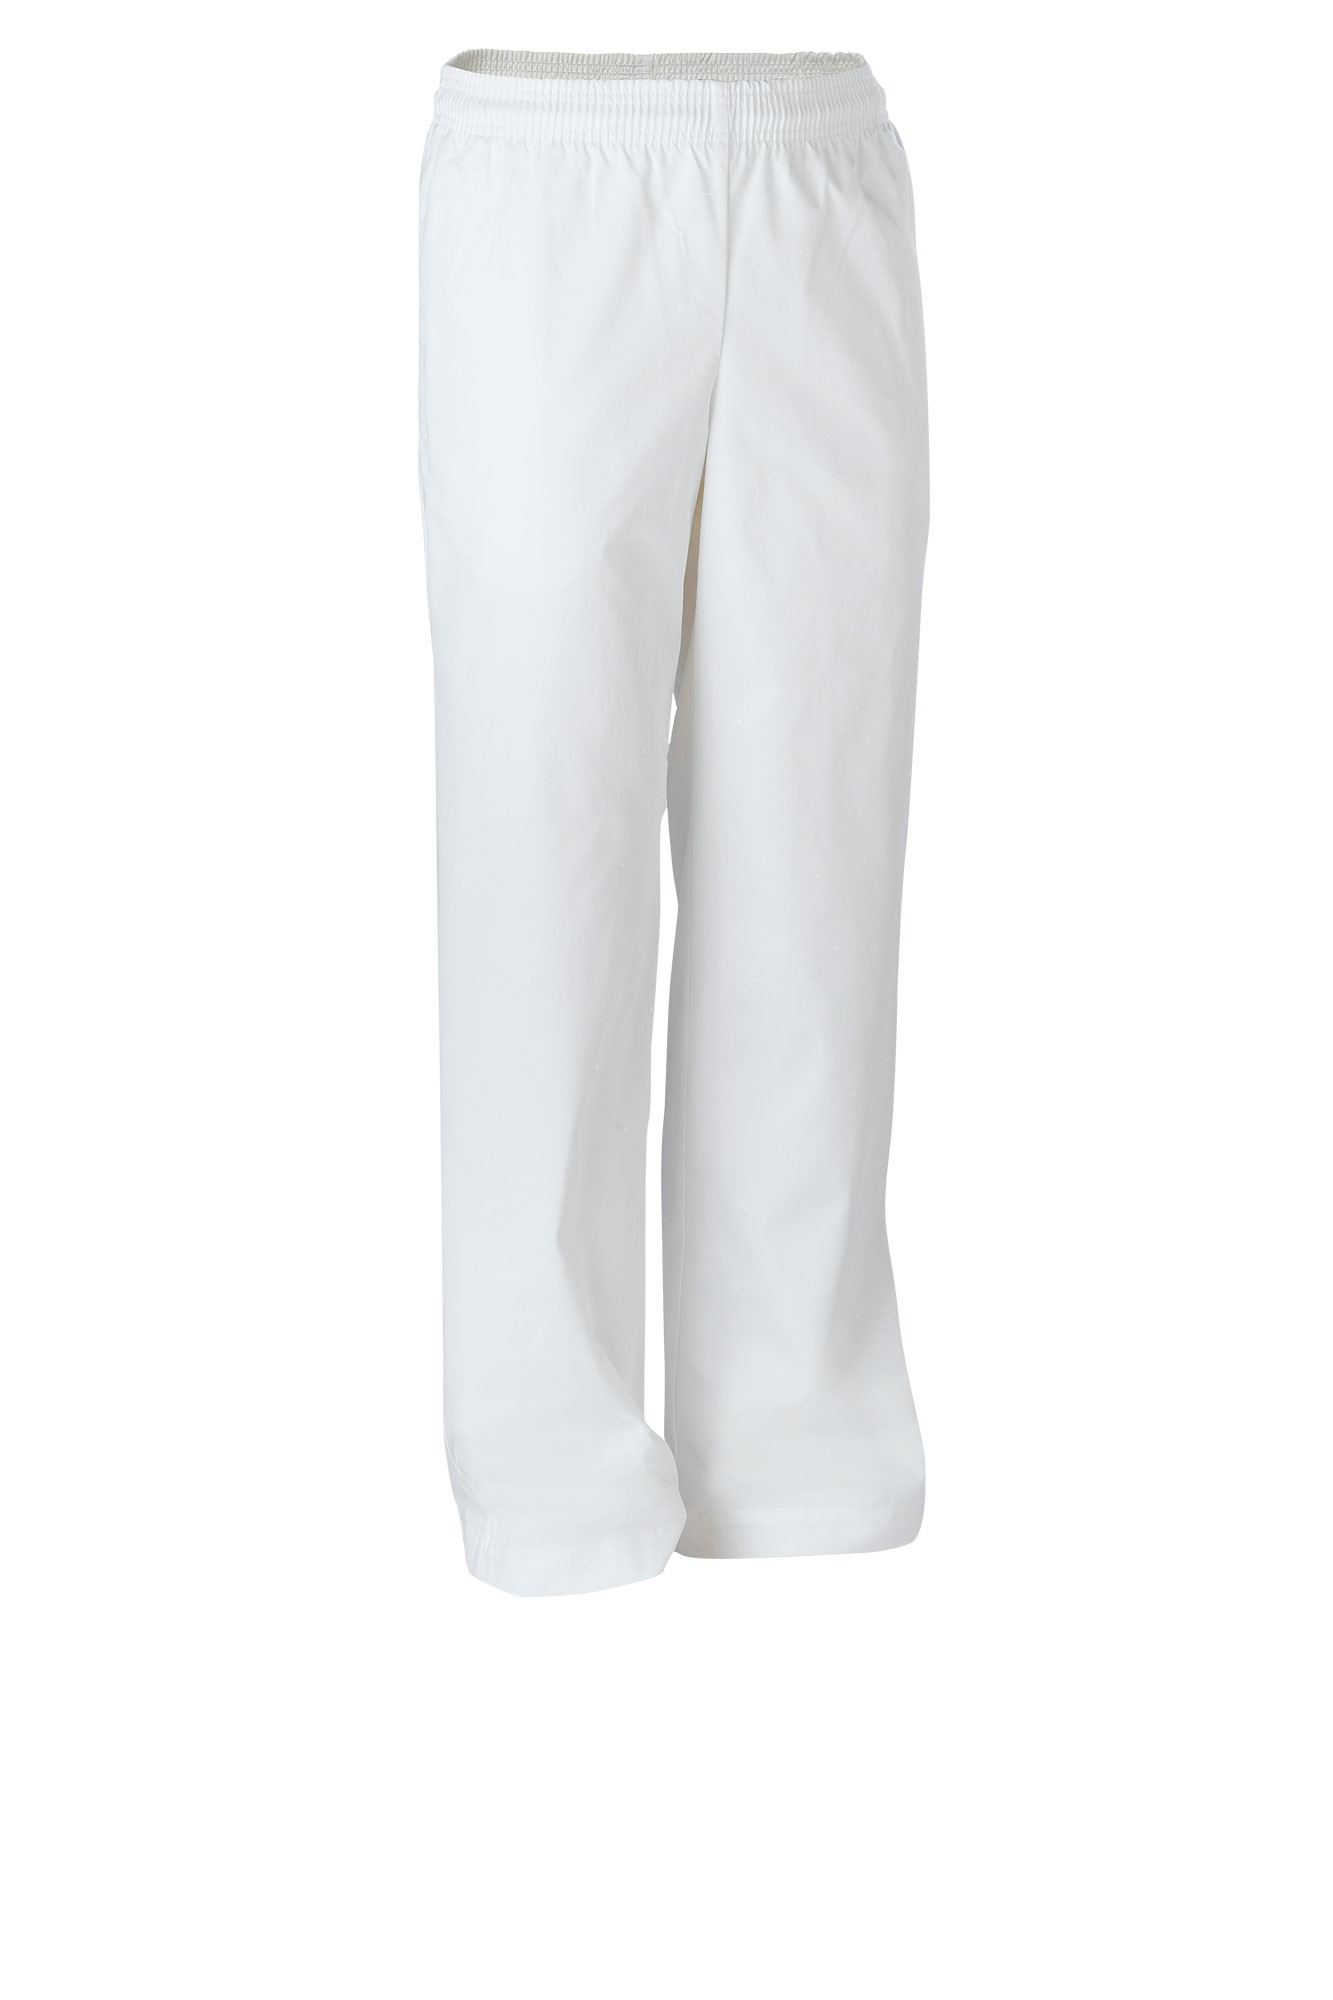 Pánské kalhoty Liam - bílá